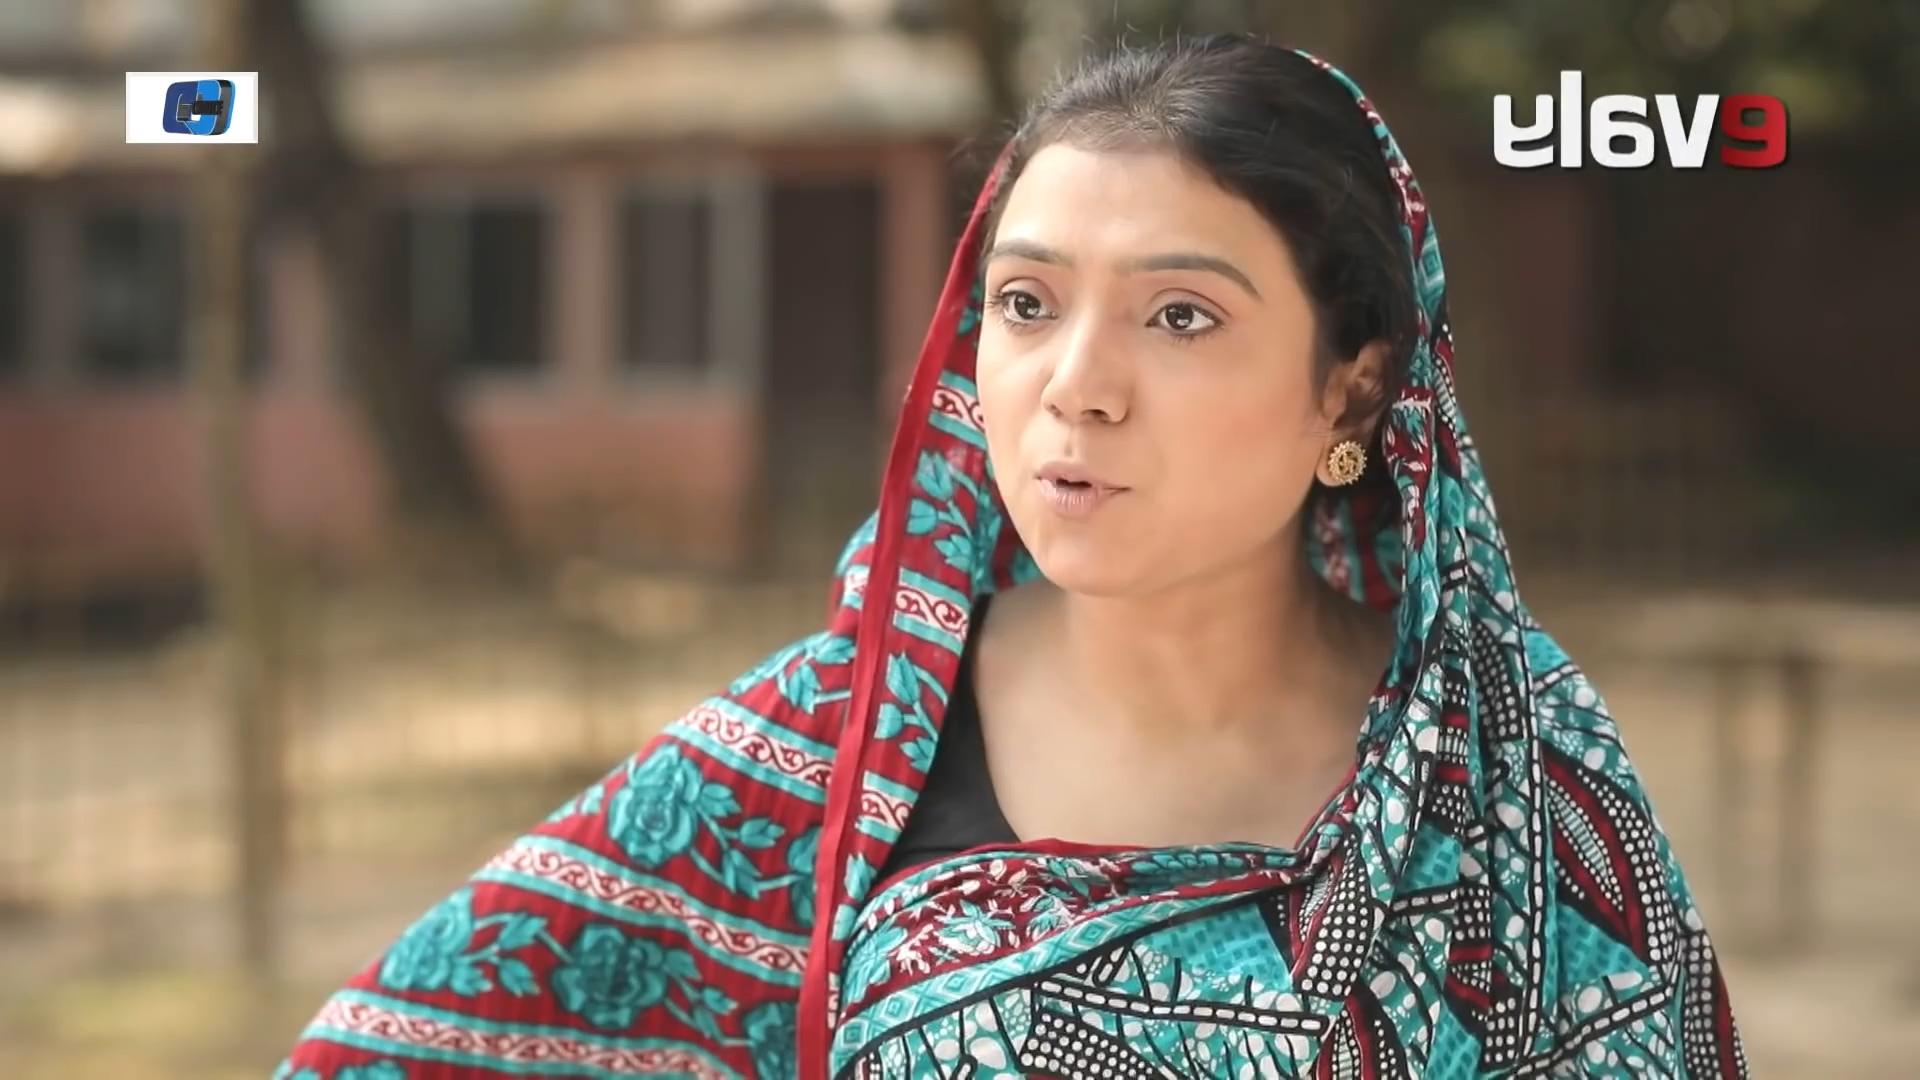 Shakkhi Hajir EiD Natok 2020 Aa Kho Mo Hasan Urmila Dipu Hazra 1080p WEBHD.mp4 20200529 074317.283